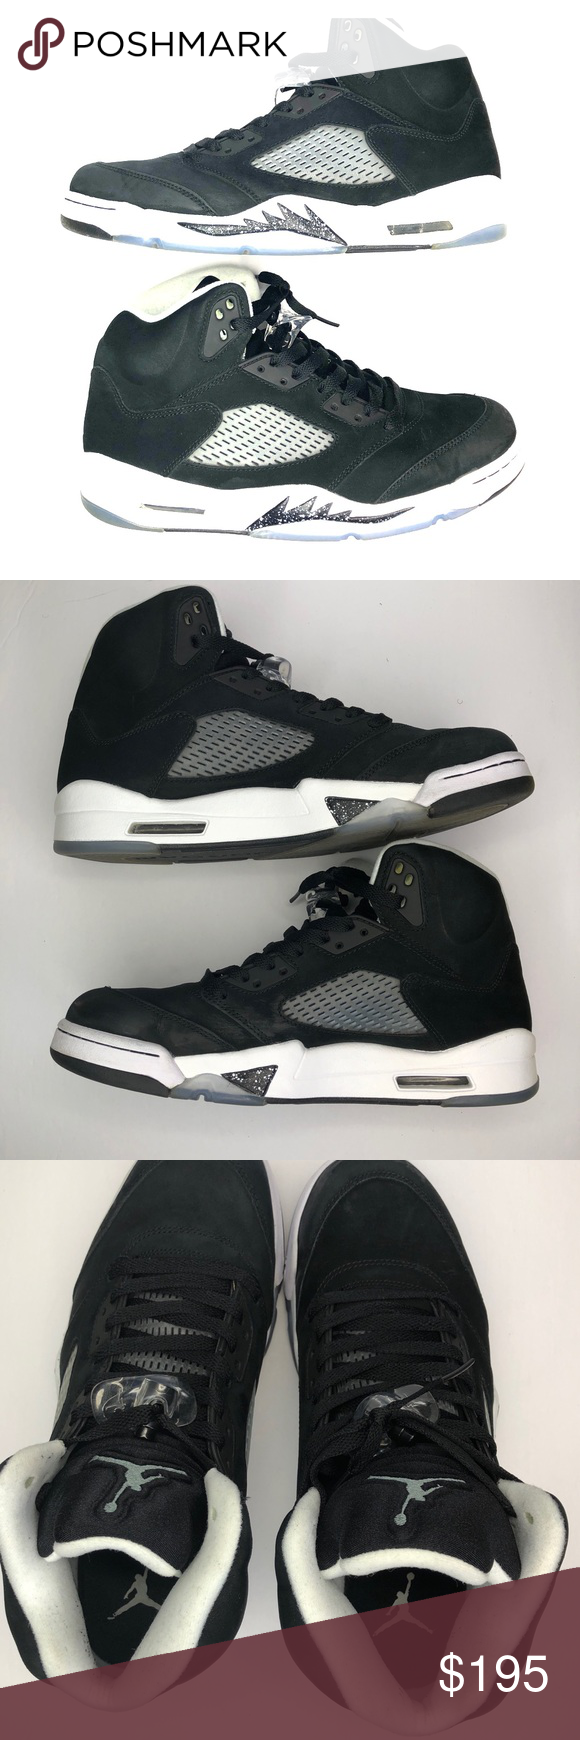 release date: cc410 000fa Nike Air Jordan Retro 11 Oreo Men size 11 Nike Air Jordan Retro 5s Oreos  Size  11 CONDITON  9 10 Lightly worn Comes with original box 100% Authentic  Nike ...